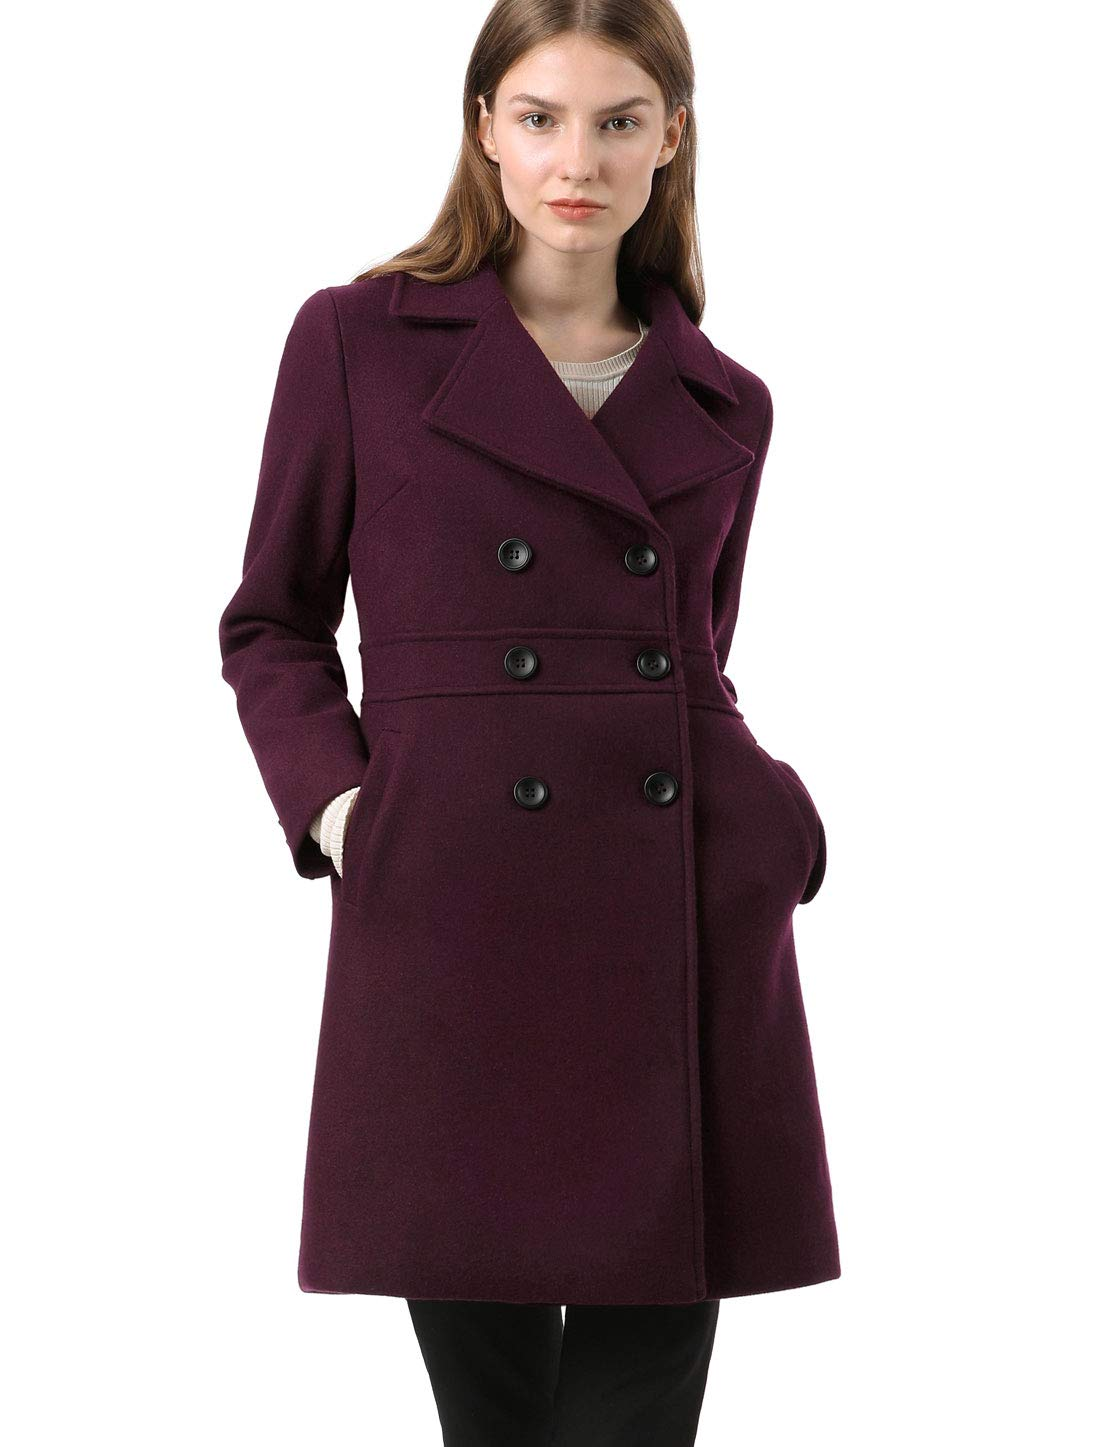 Allegra K Women's Double Breasted Notched Lapel Long Winter Coats Purplish XS (US 2) by Allegra K